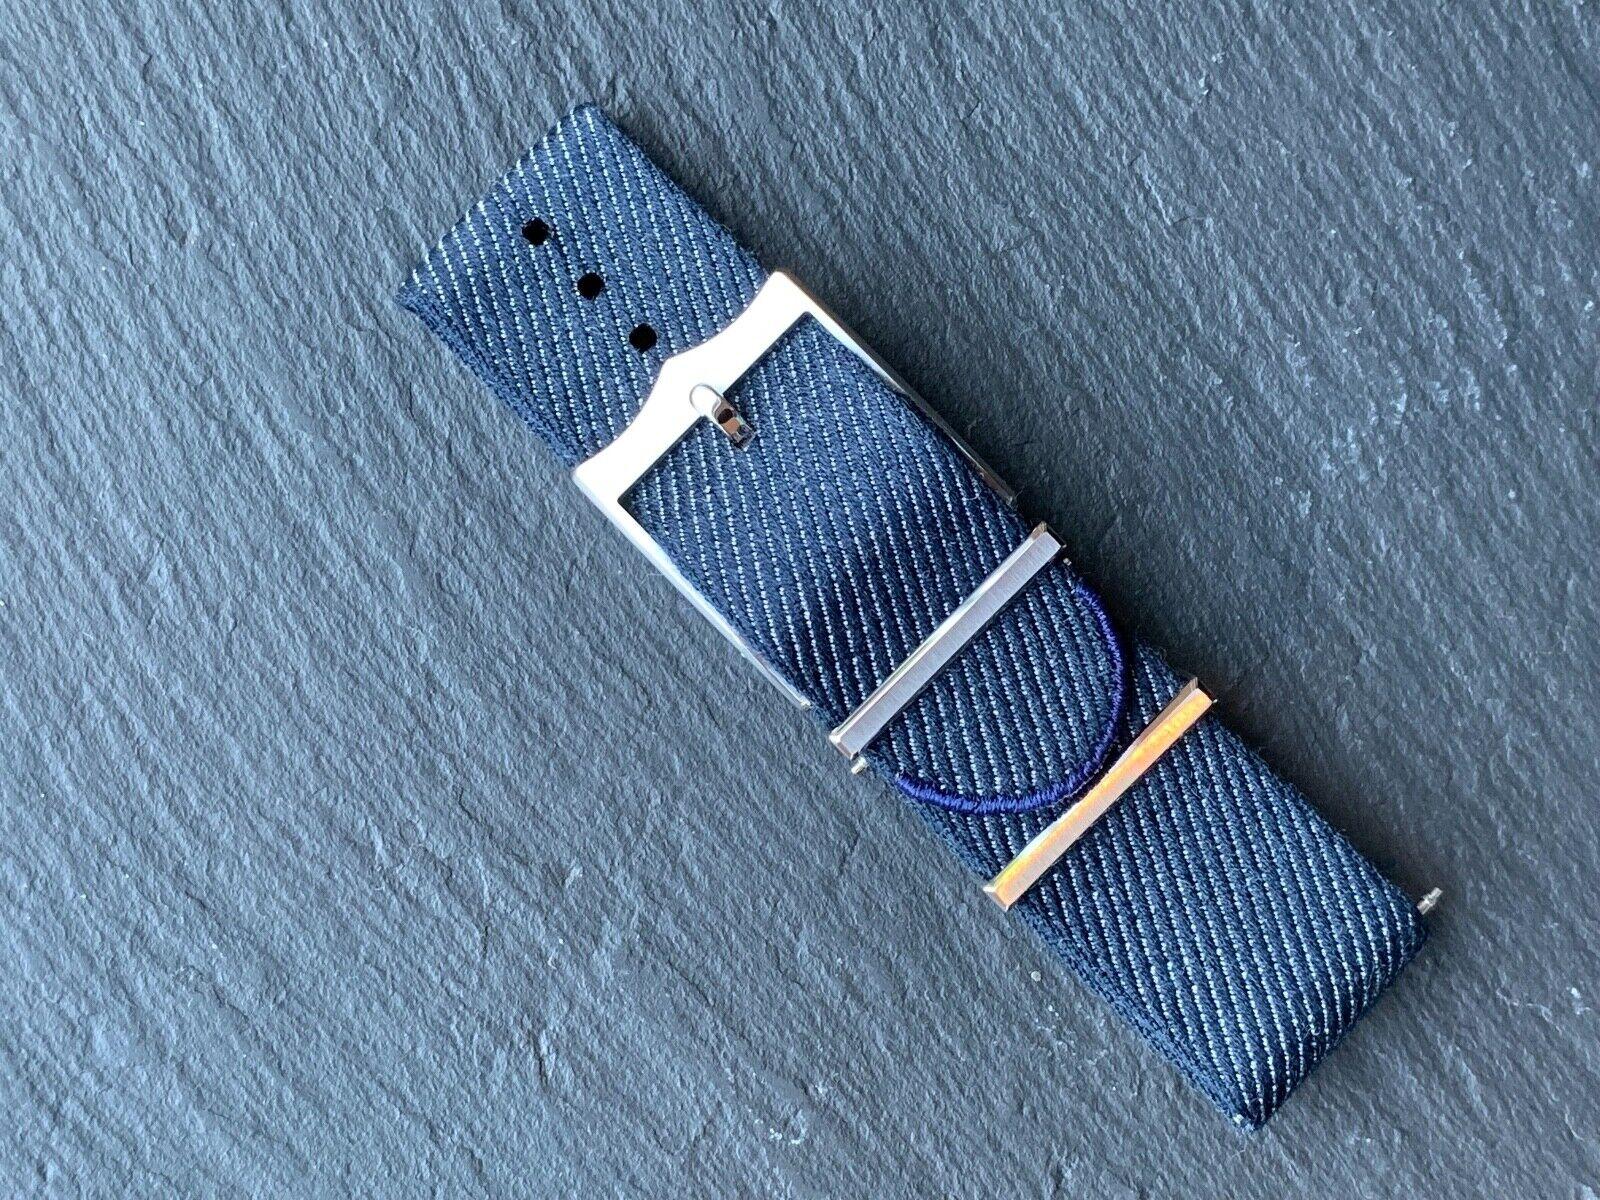 Tudor Heritage Natoband Tiss Bleu Marin/ M STD 4347417 ORIGINAL 22mm